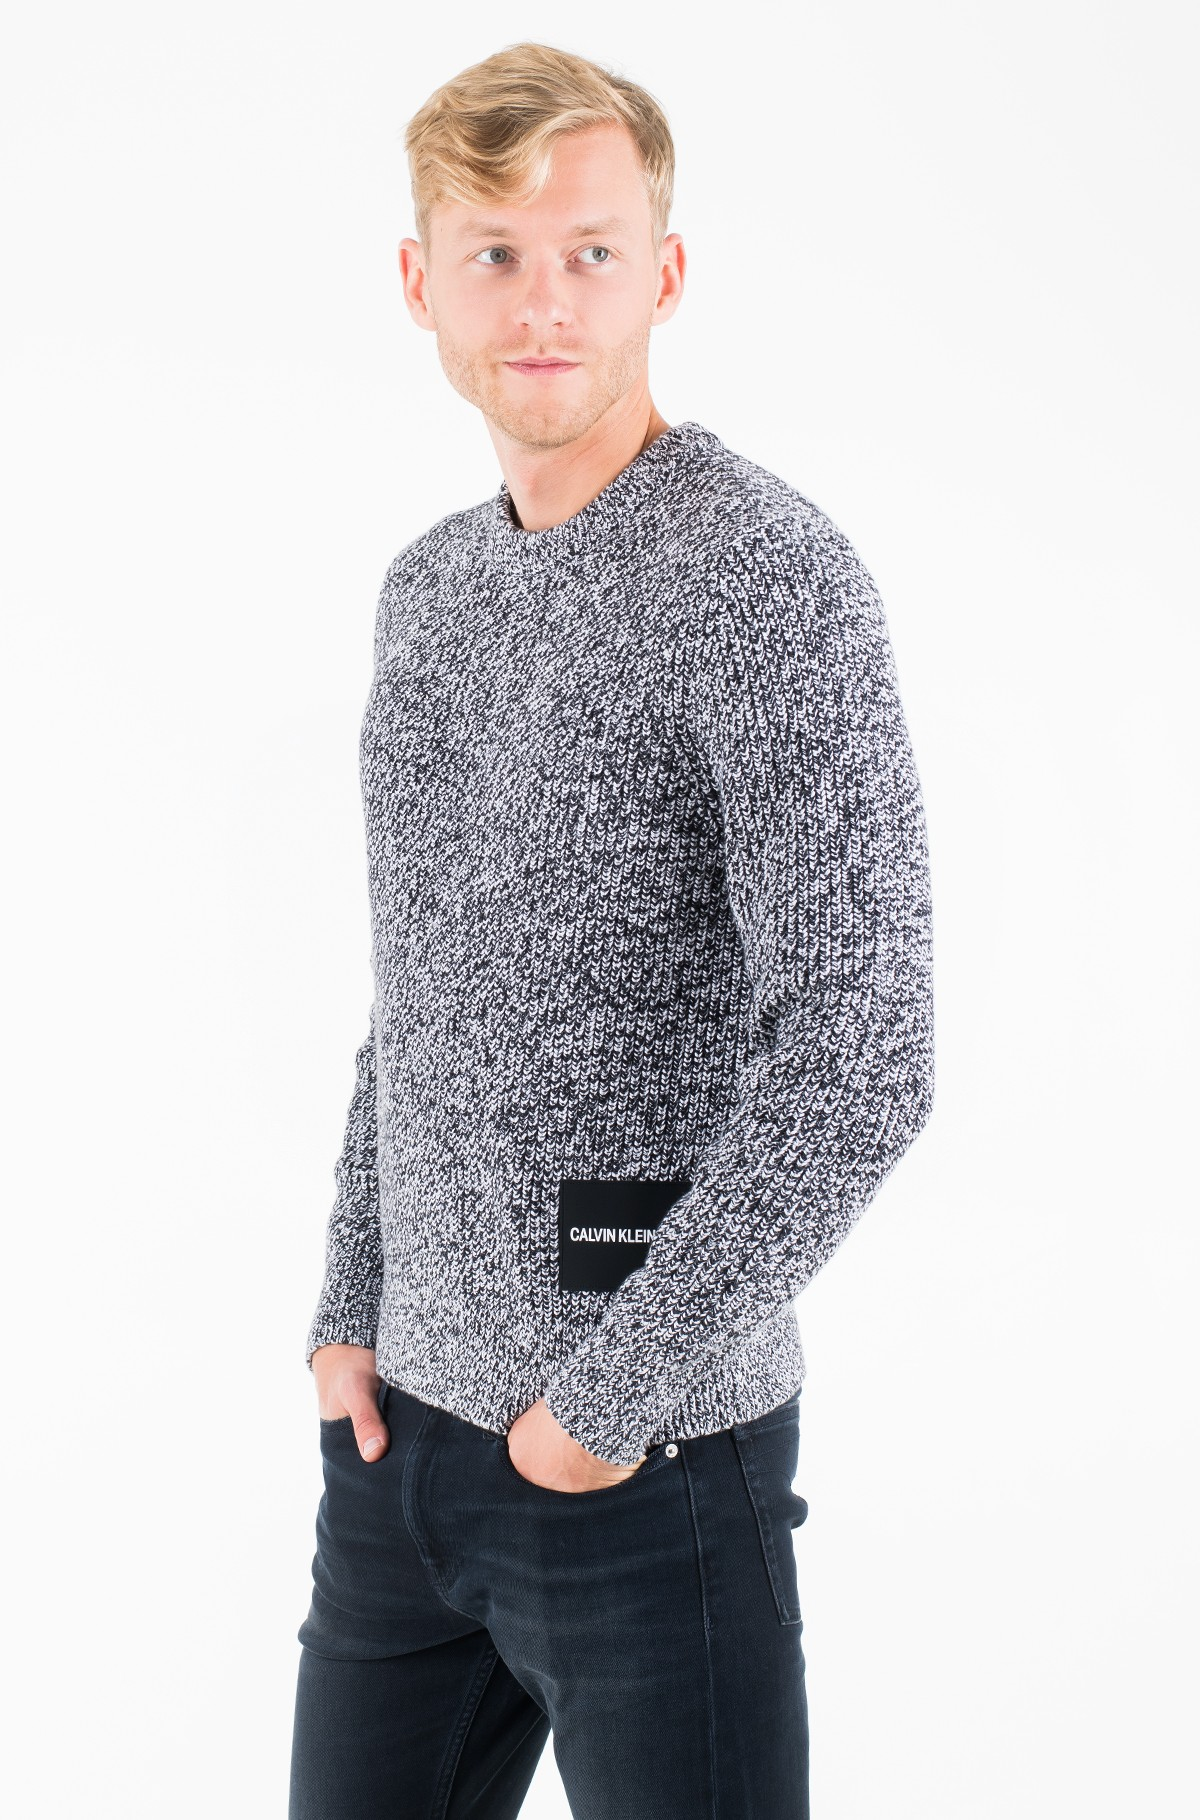 Sweater CARDIGAN STITCH CN SWEATER-full-1